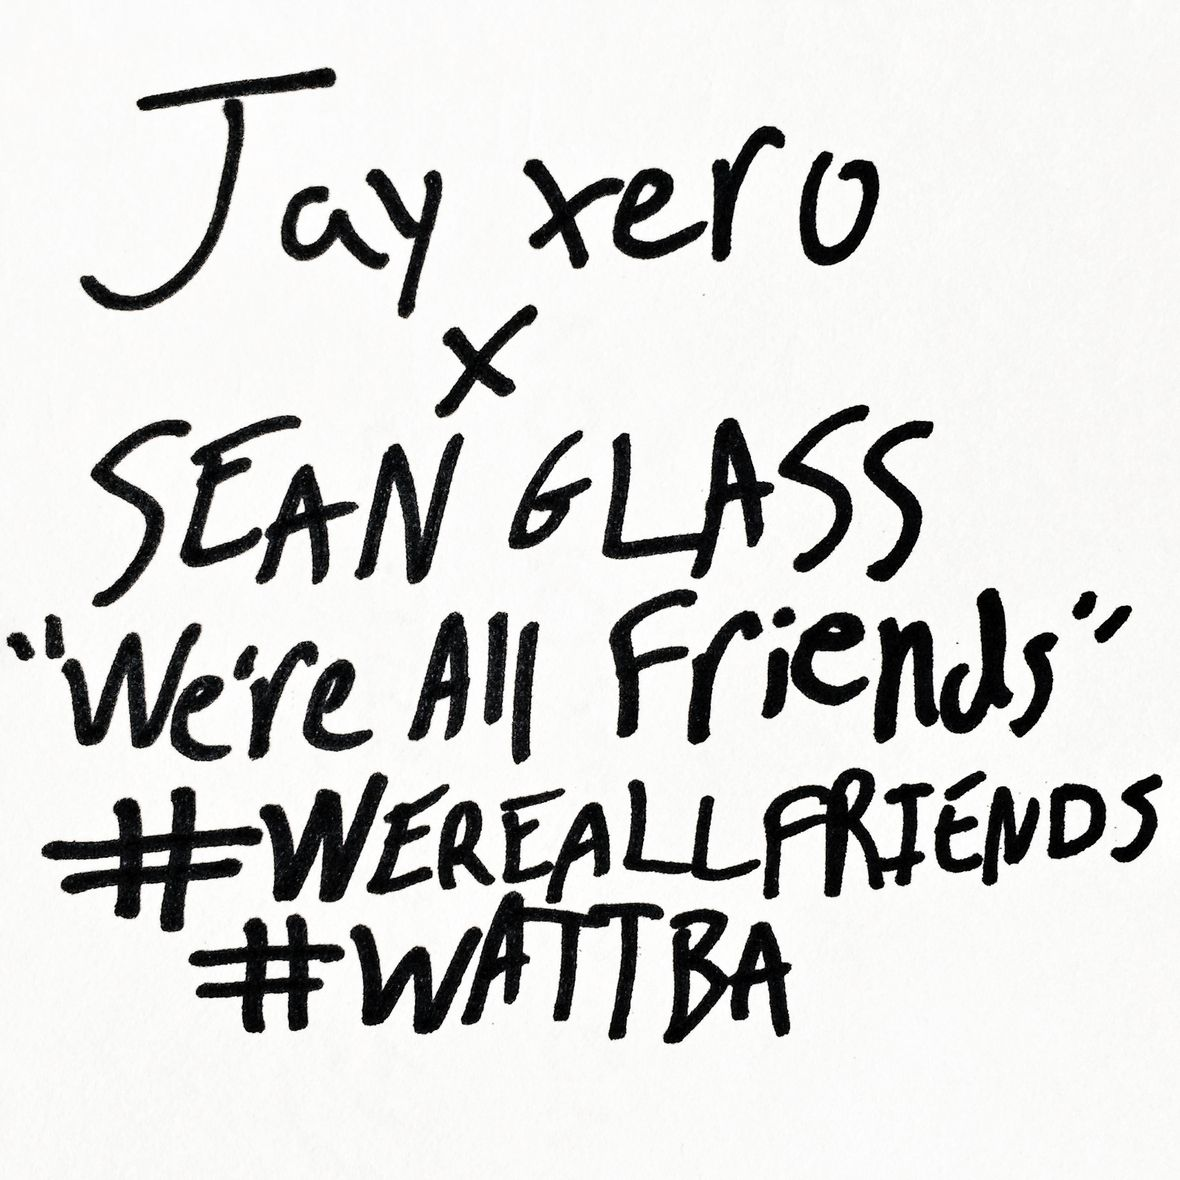 jay_xero_sean_glass_-_we_re_all_friends_artwork.jpg